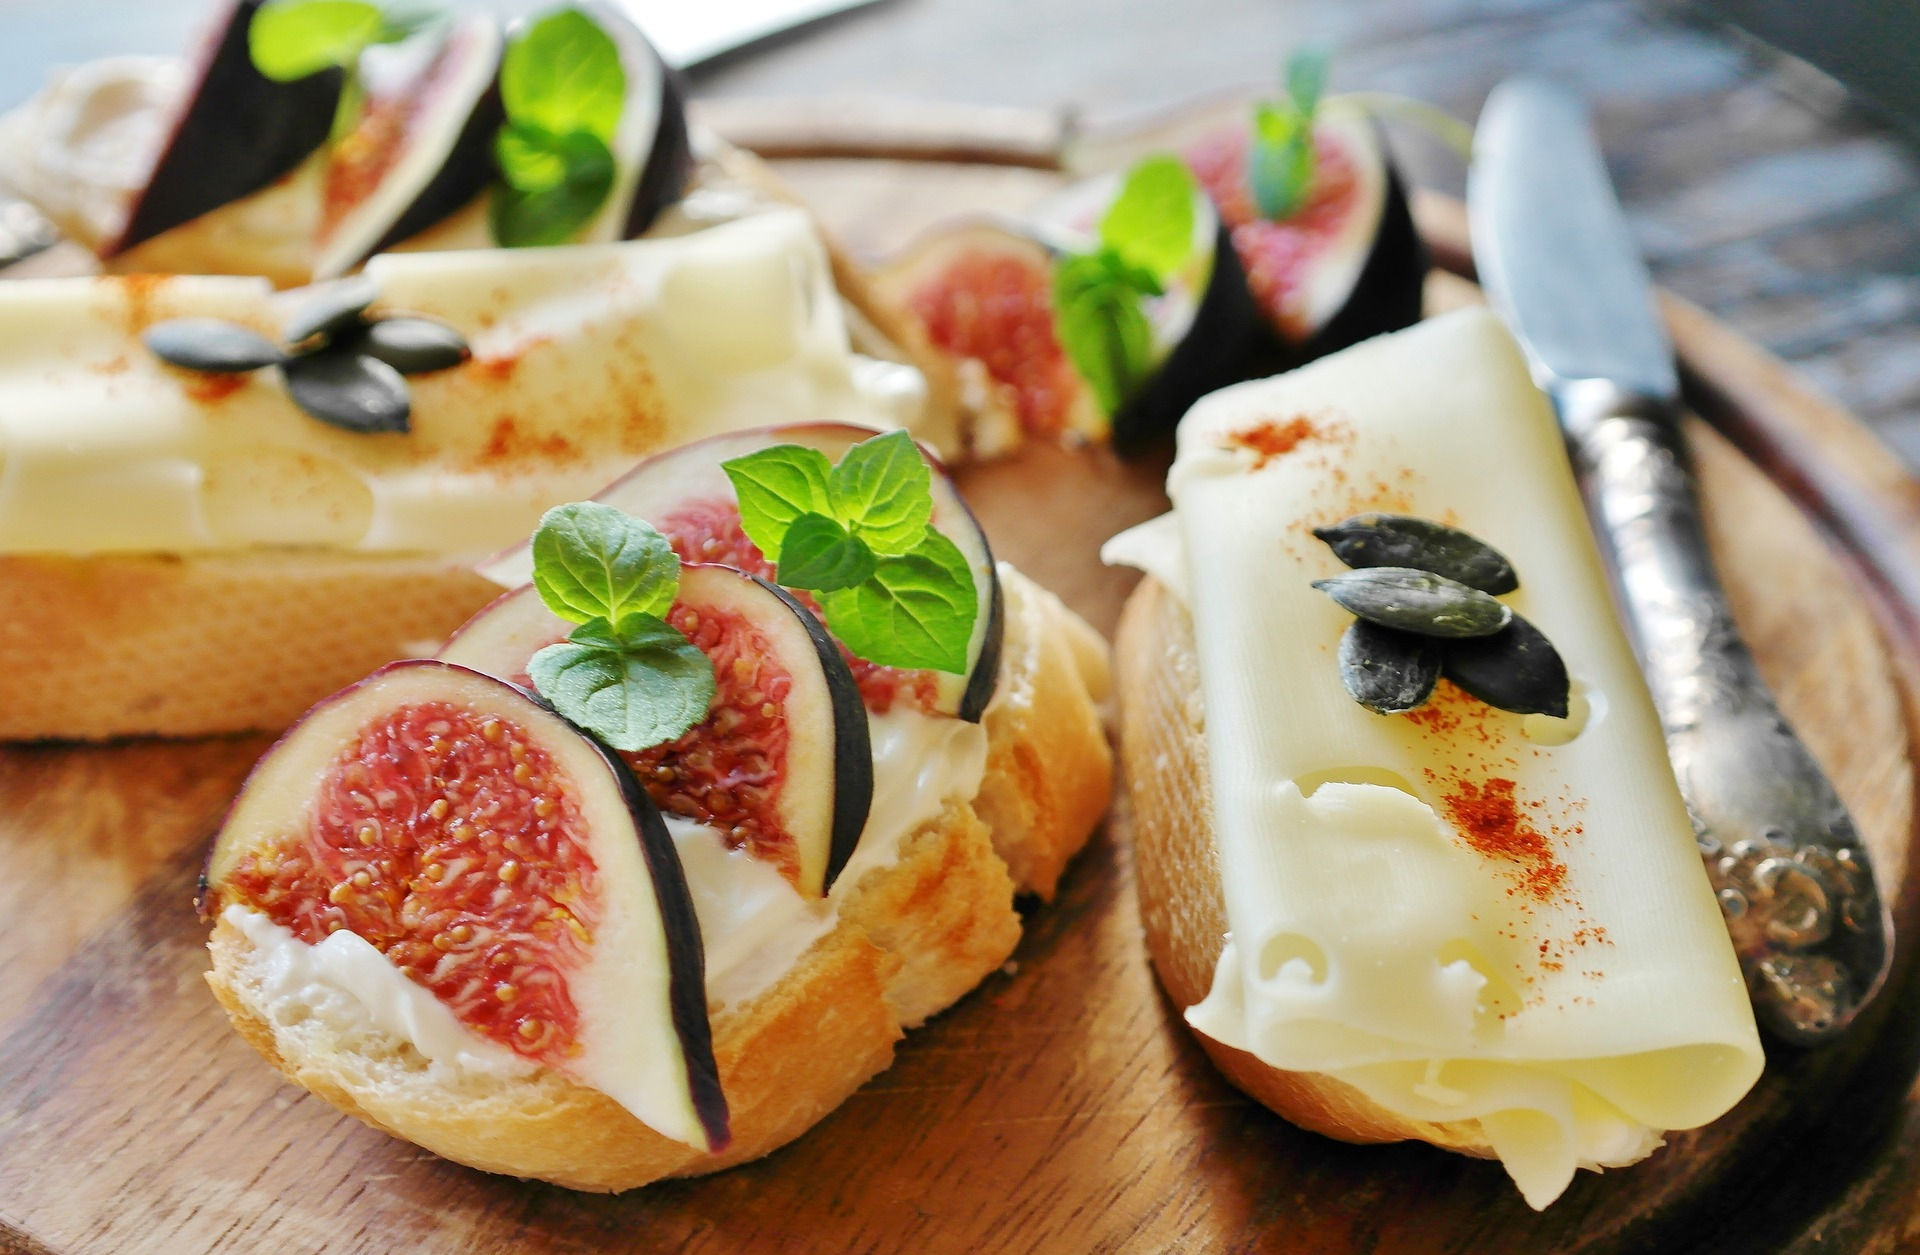 Arrowine & Cheese